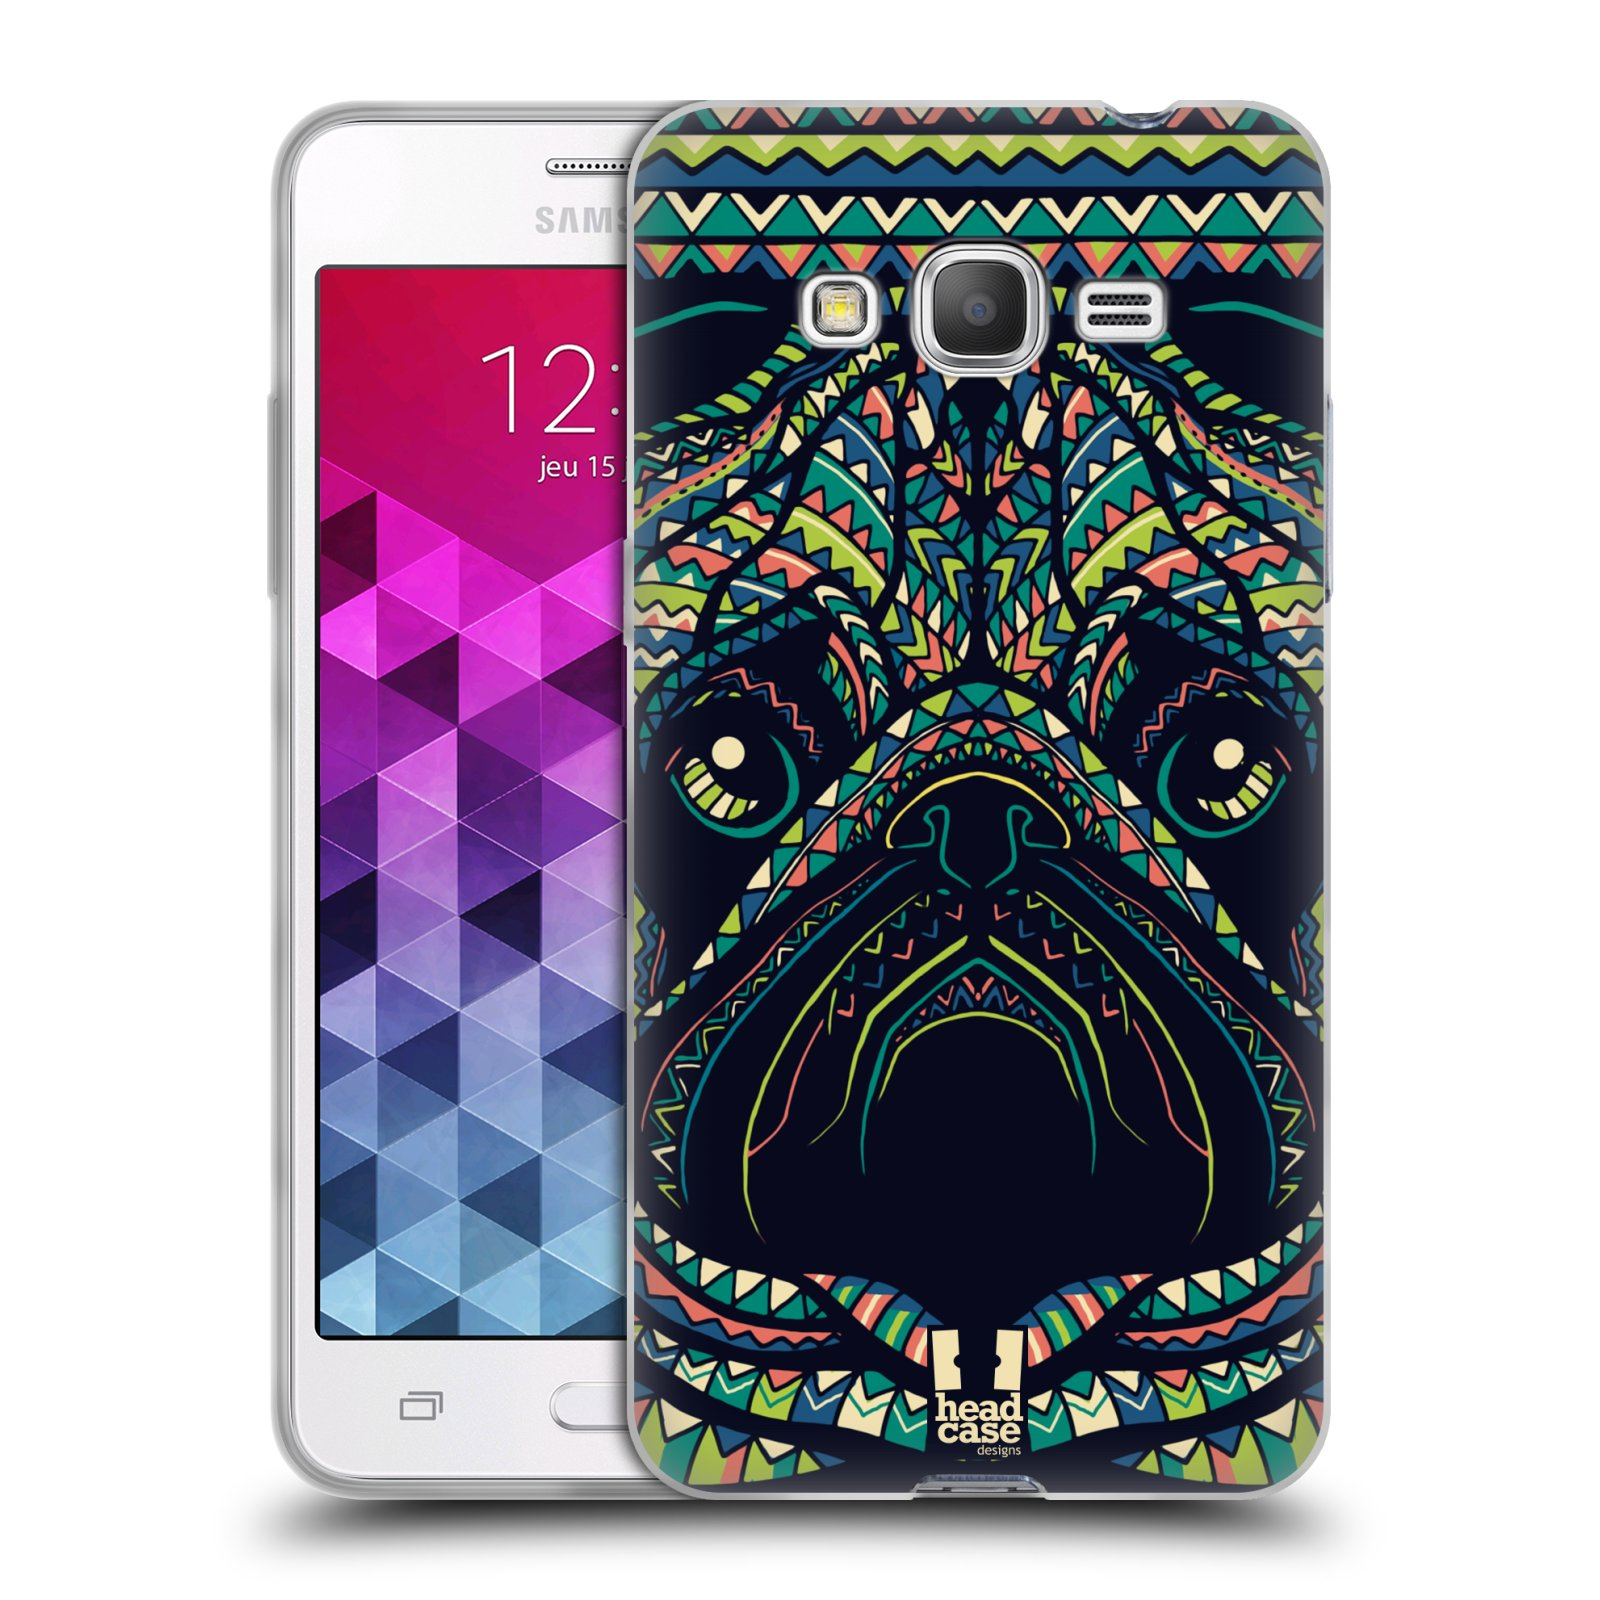 Silikonové pouzdro na mobil Samsung Galaxy Grand Prime HEAD CASE AZTEC MOPS